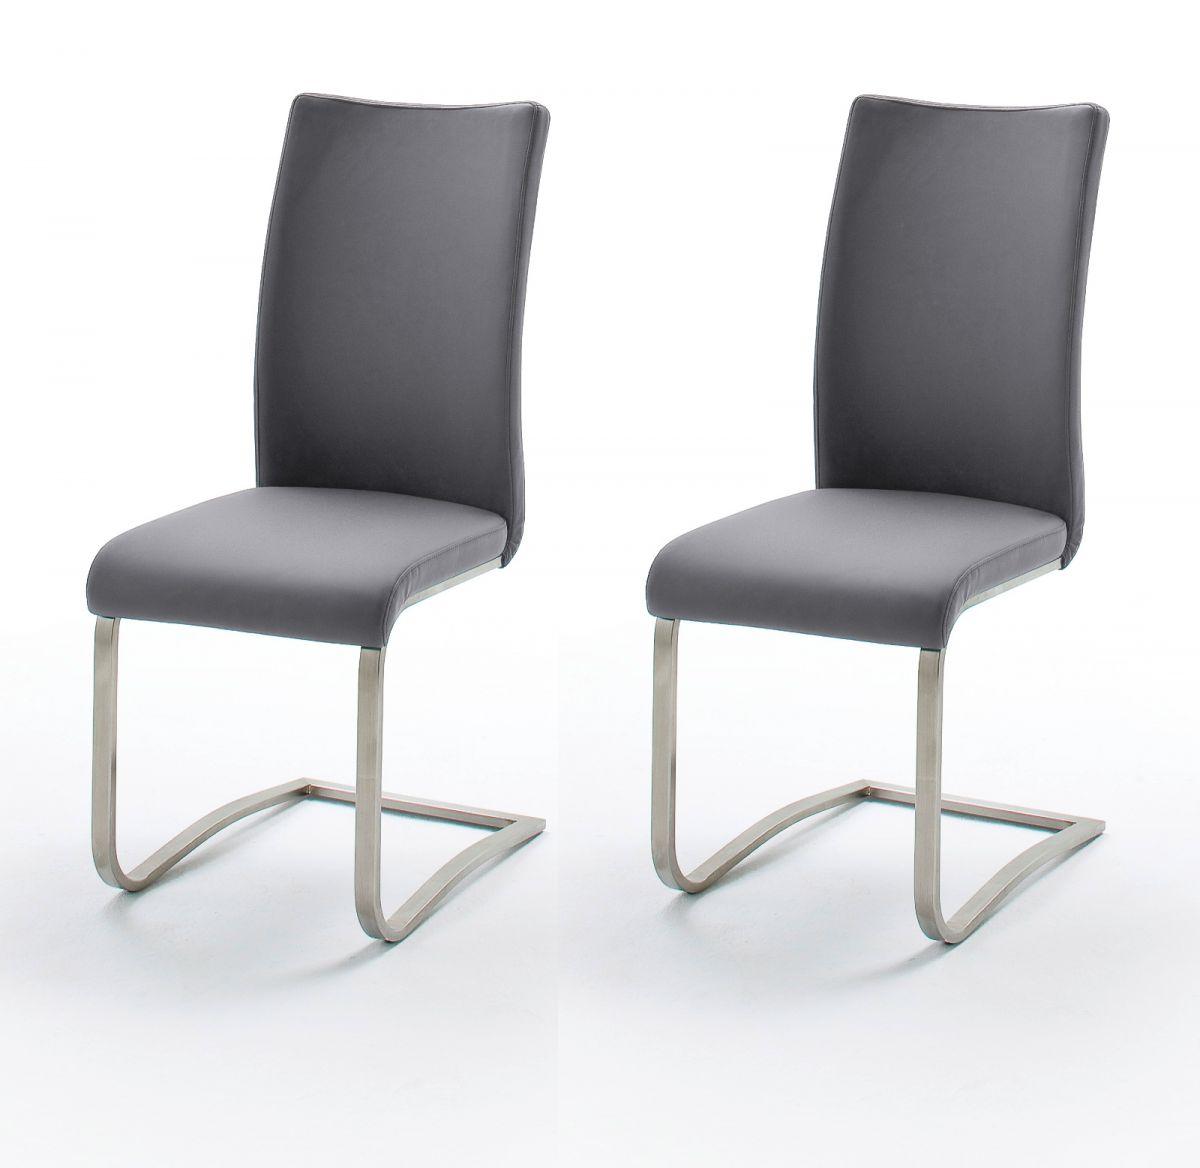 2 x Stuhl Arco Grau Schwinger Kunstleder